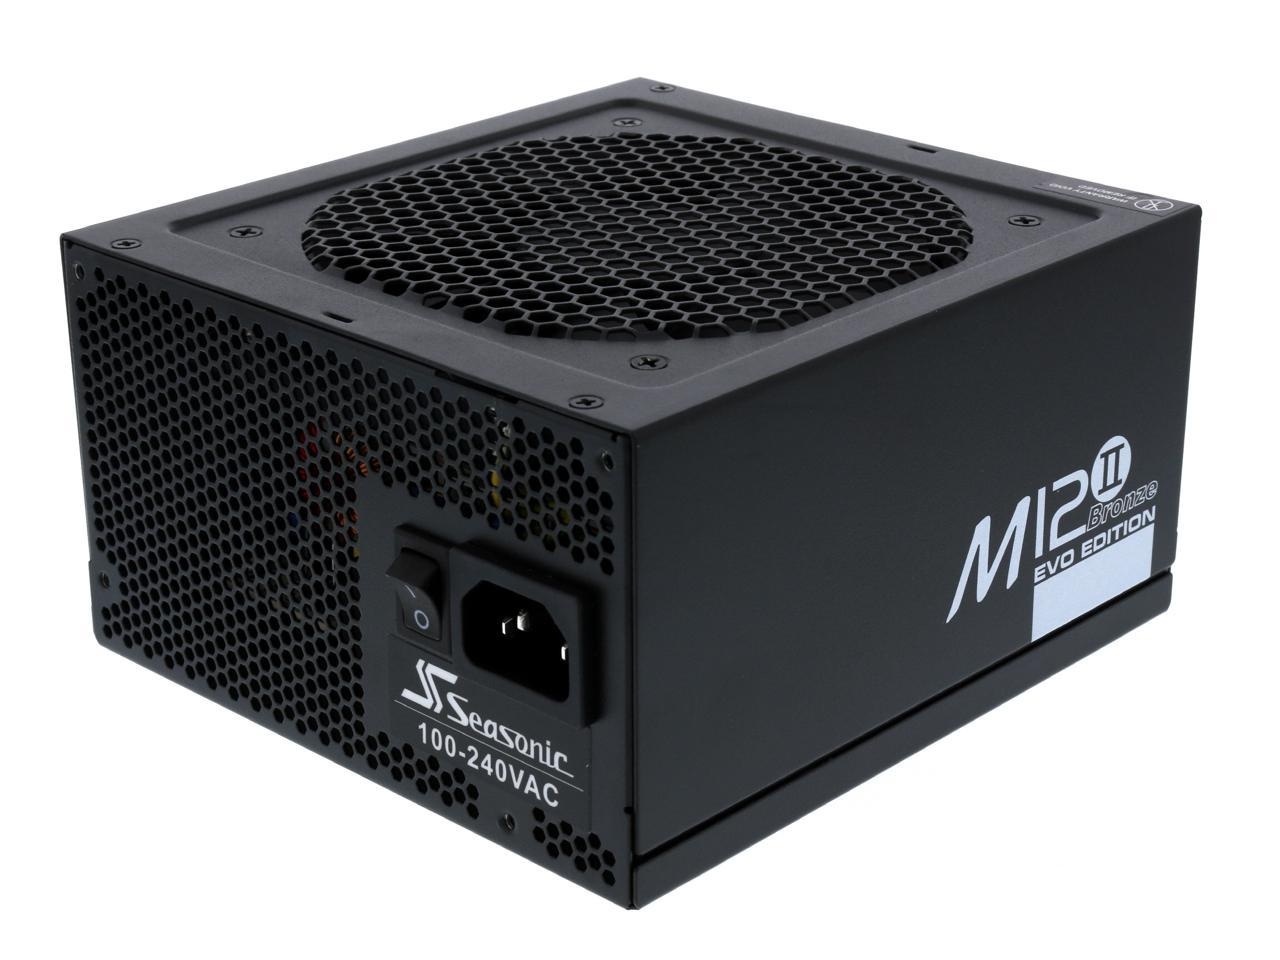 SeaSonic M12II 520 Bronze EVO Edition 520W Full Modular Active PFC Power Supply